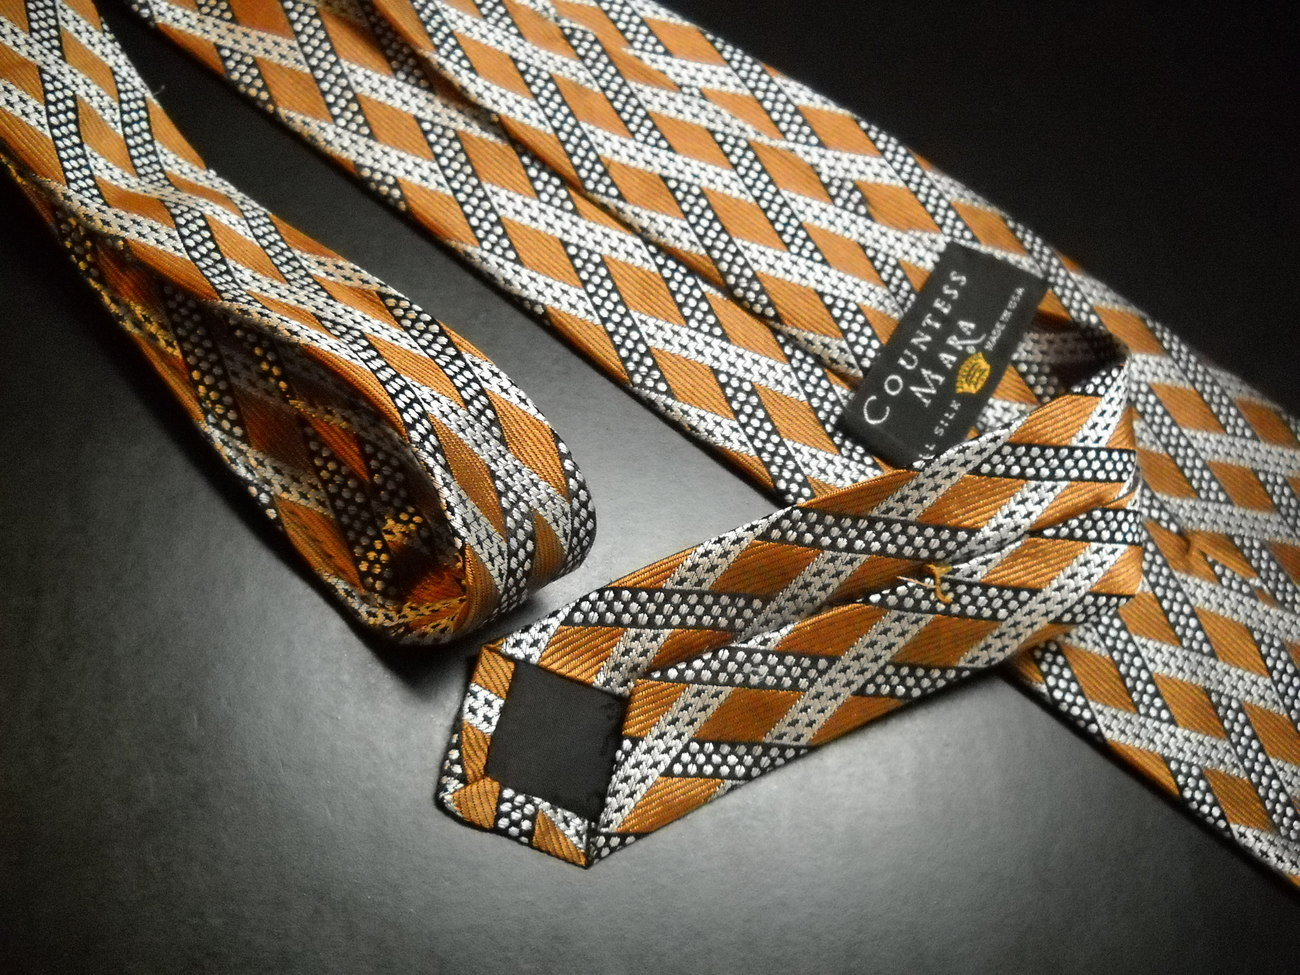 Countess Mara Neck Tie Silk Criss Crossing Diagonal Stripes Golds Silver Black